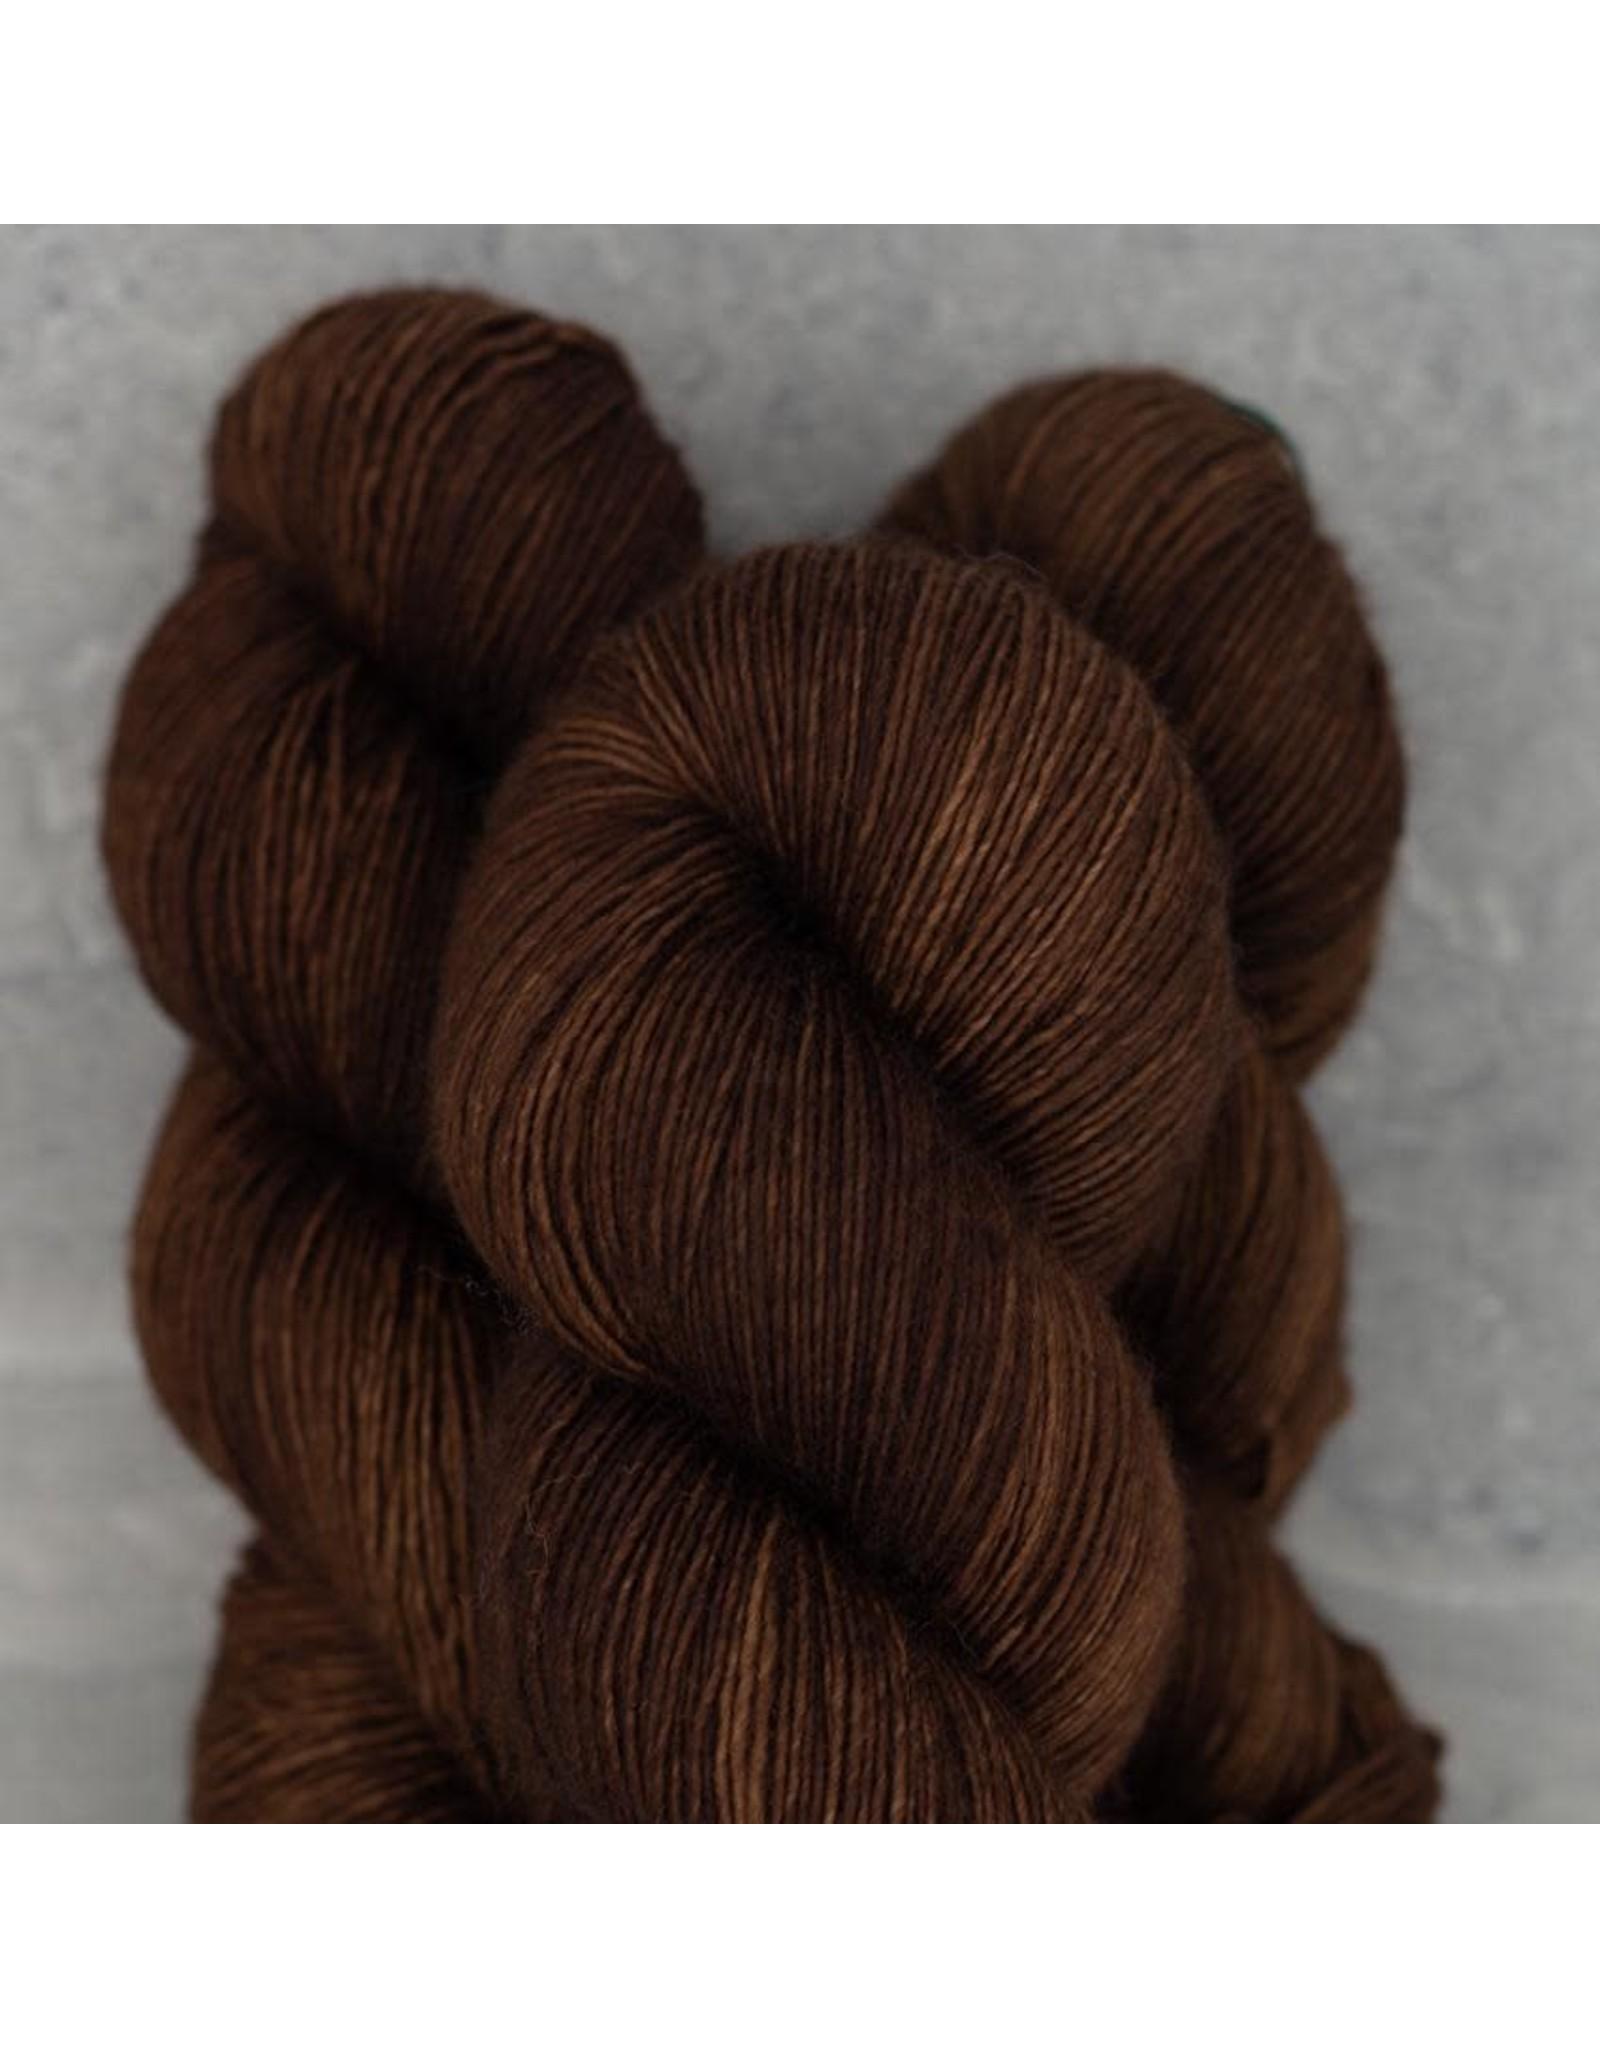 Ristretto - Unicorn Tails - Madelinetosh